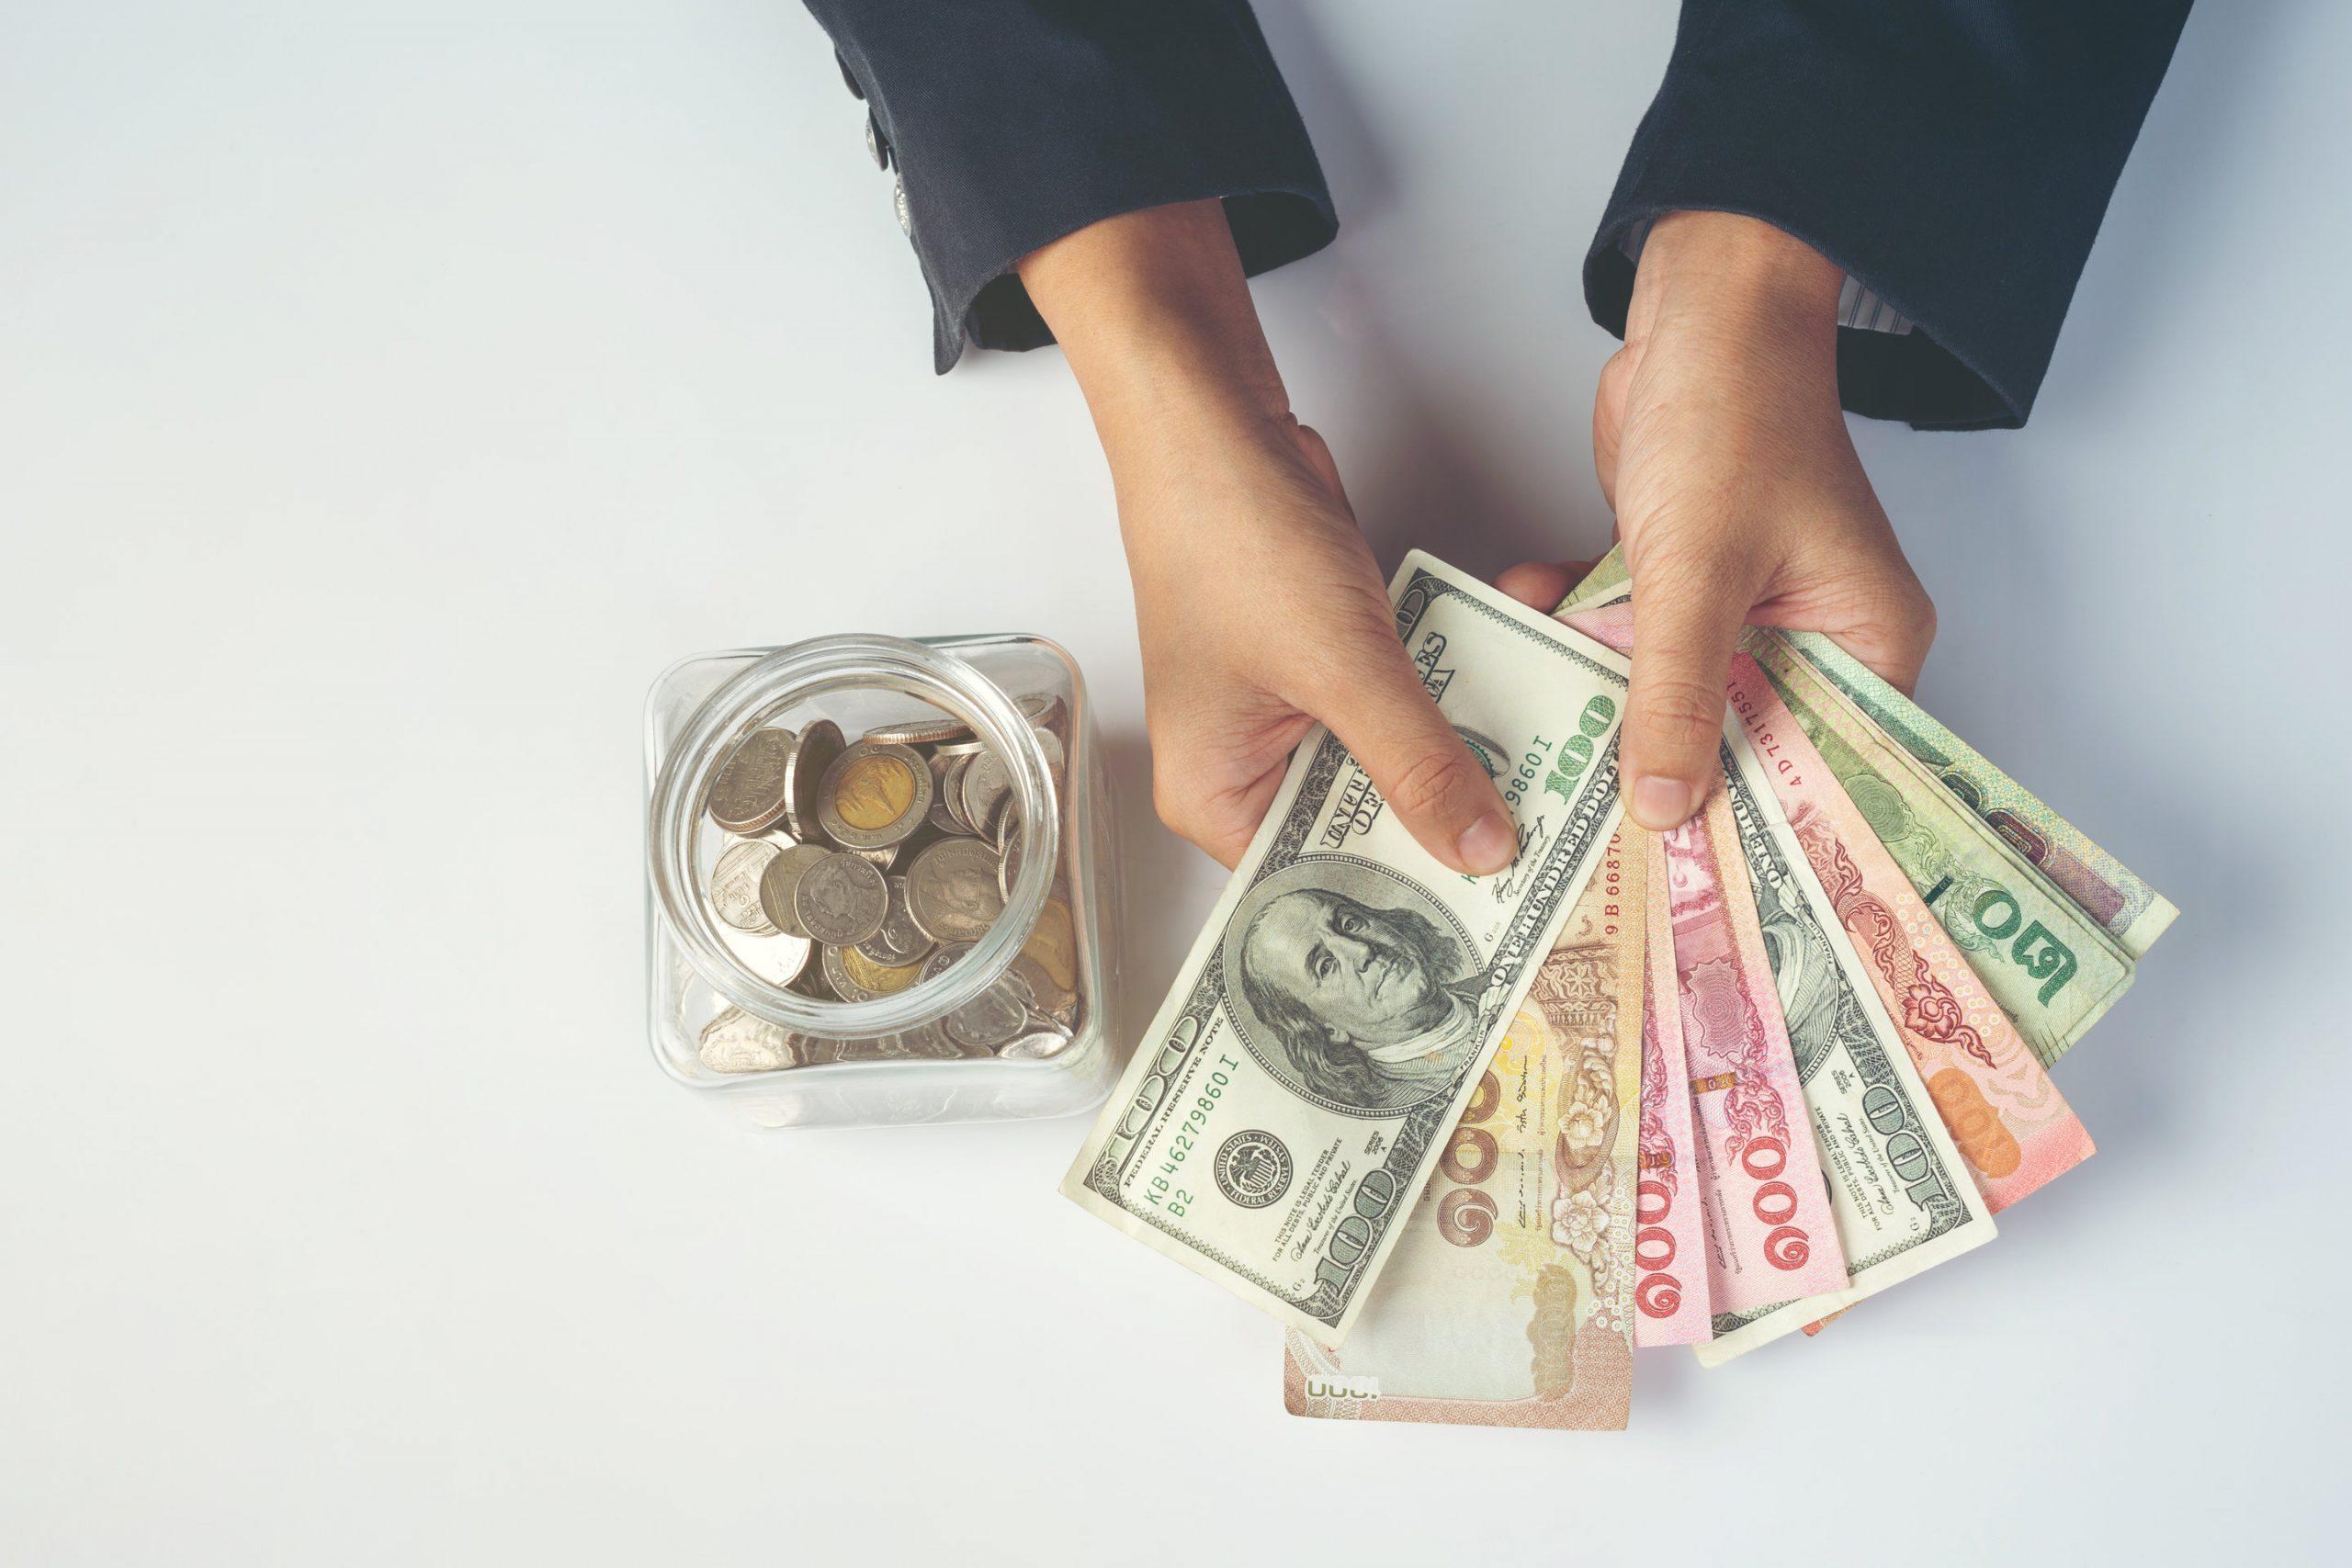 simpan uang gajian untuk keluar dari rumah mertua